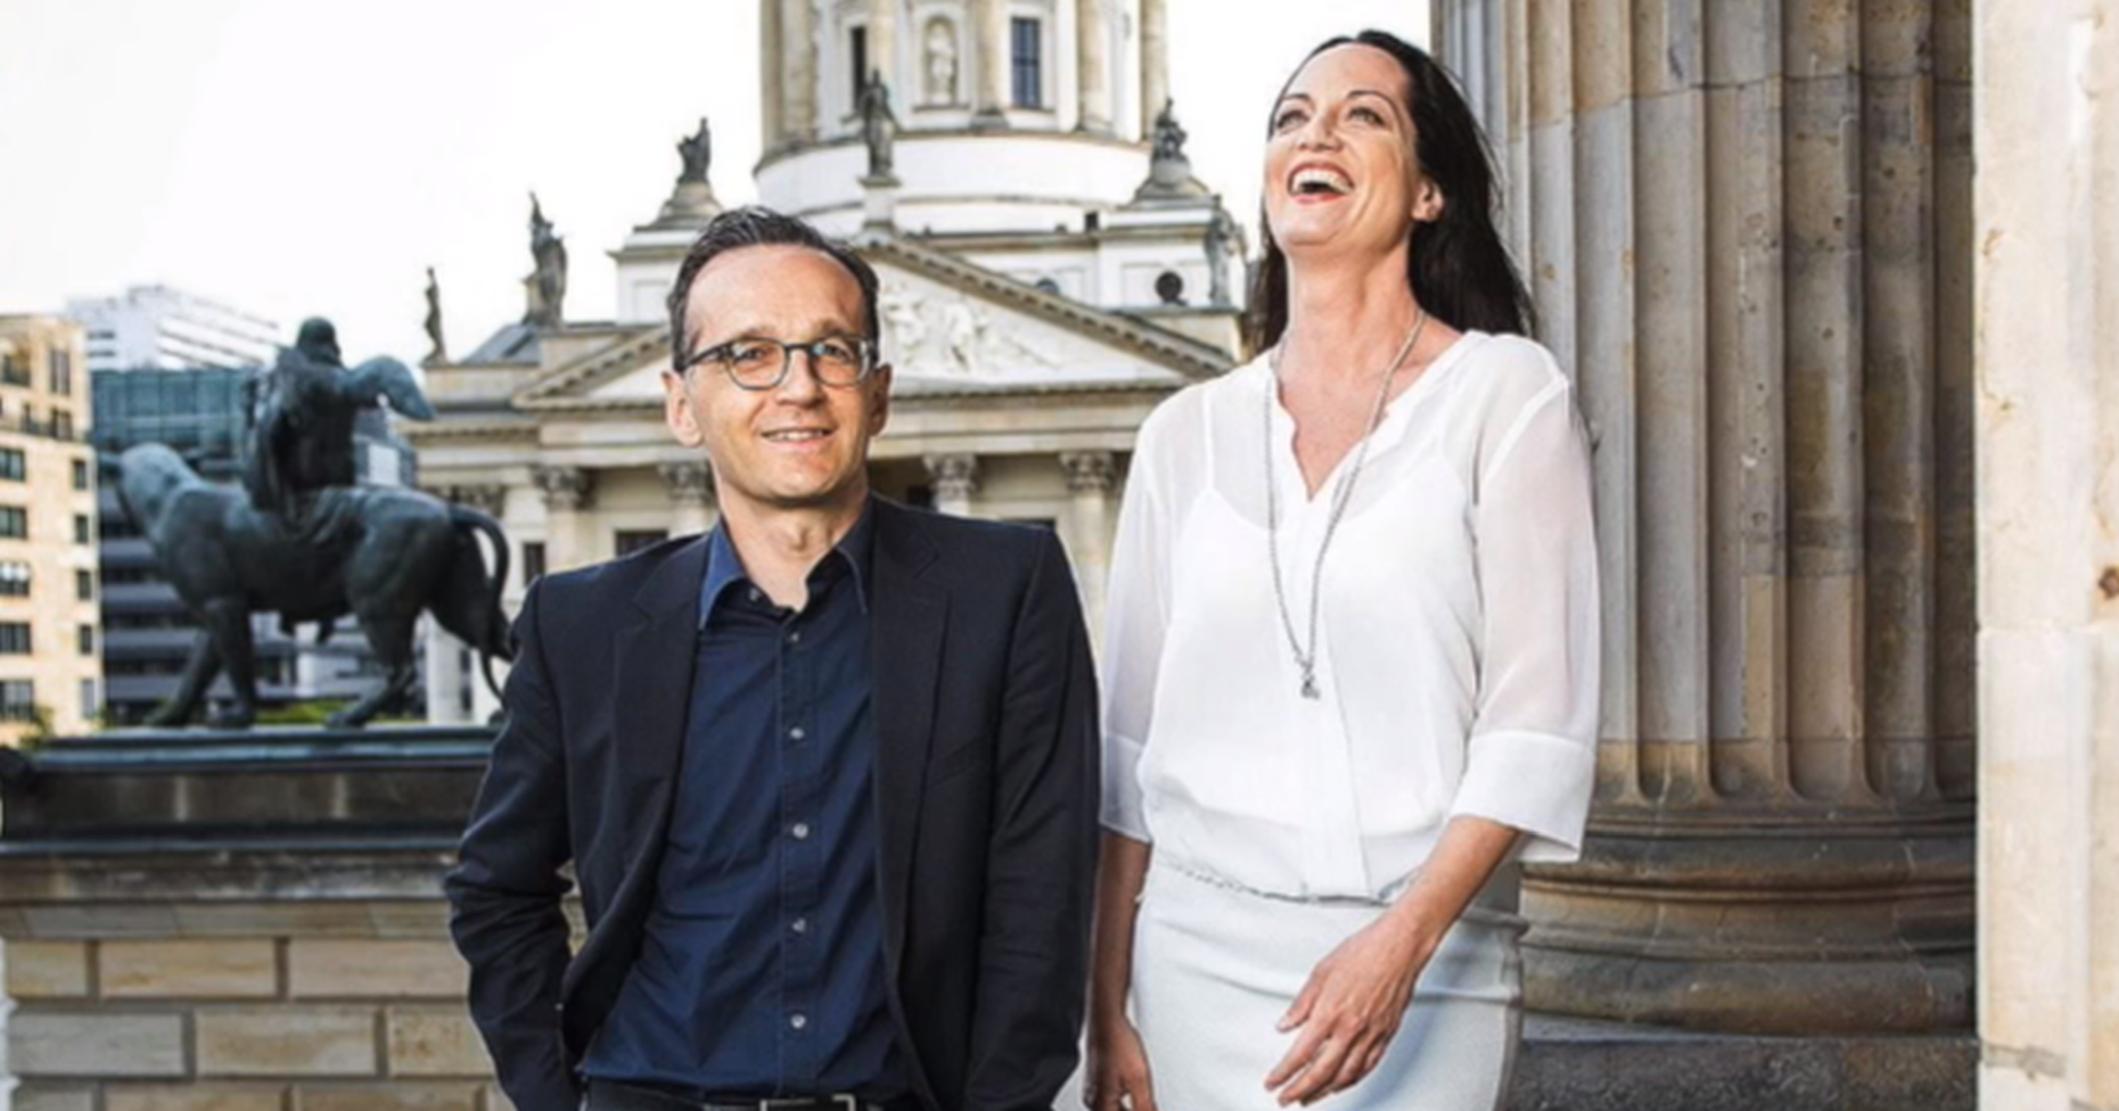 Heiko Maas Und Natalia Wörner